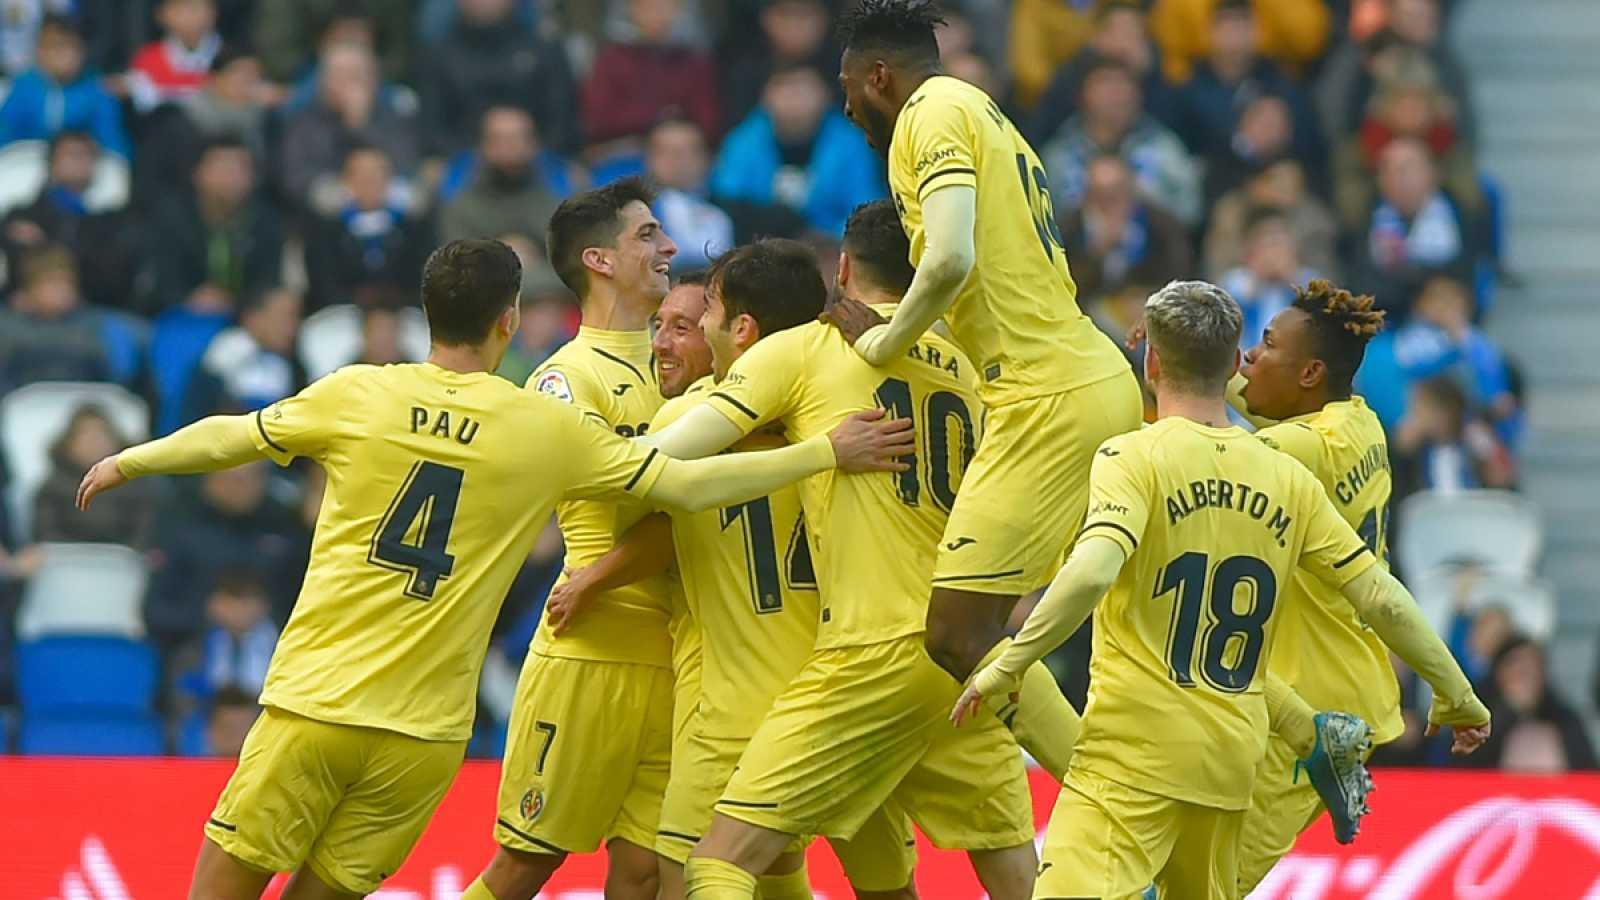 Santi Cazorla celebra el gol con sus compañeros